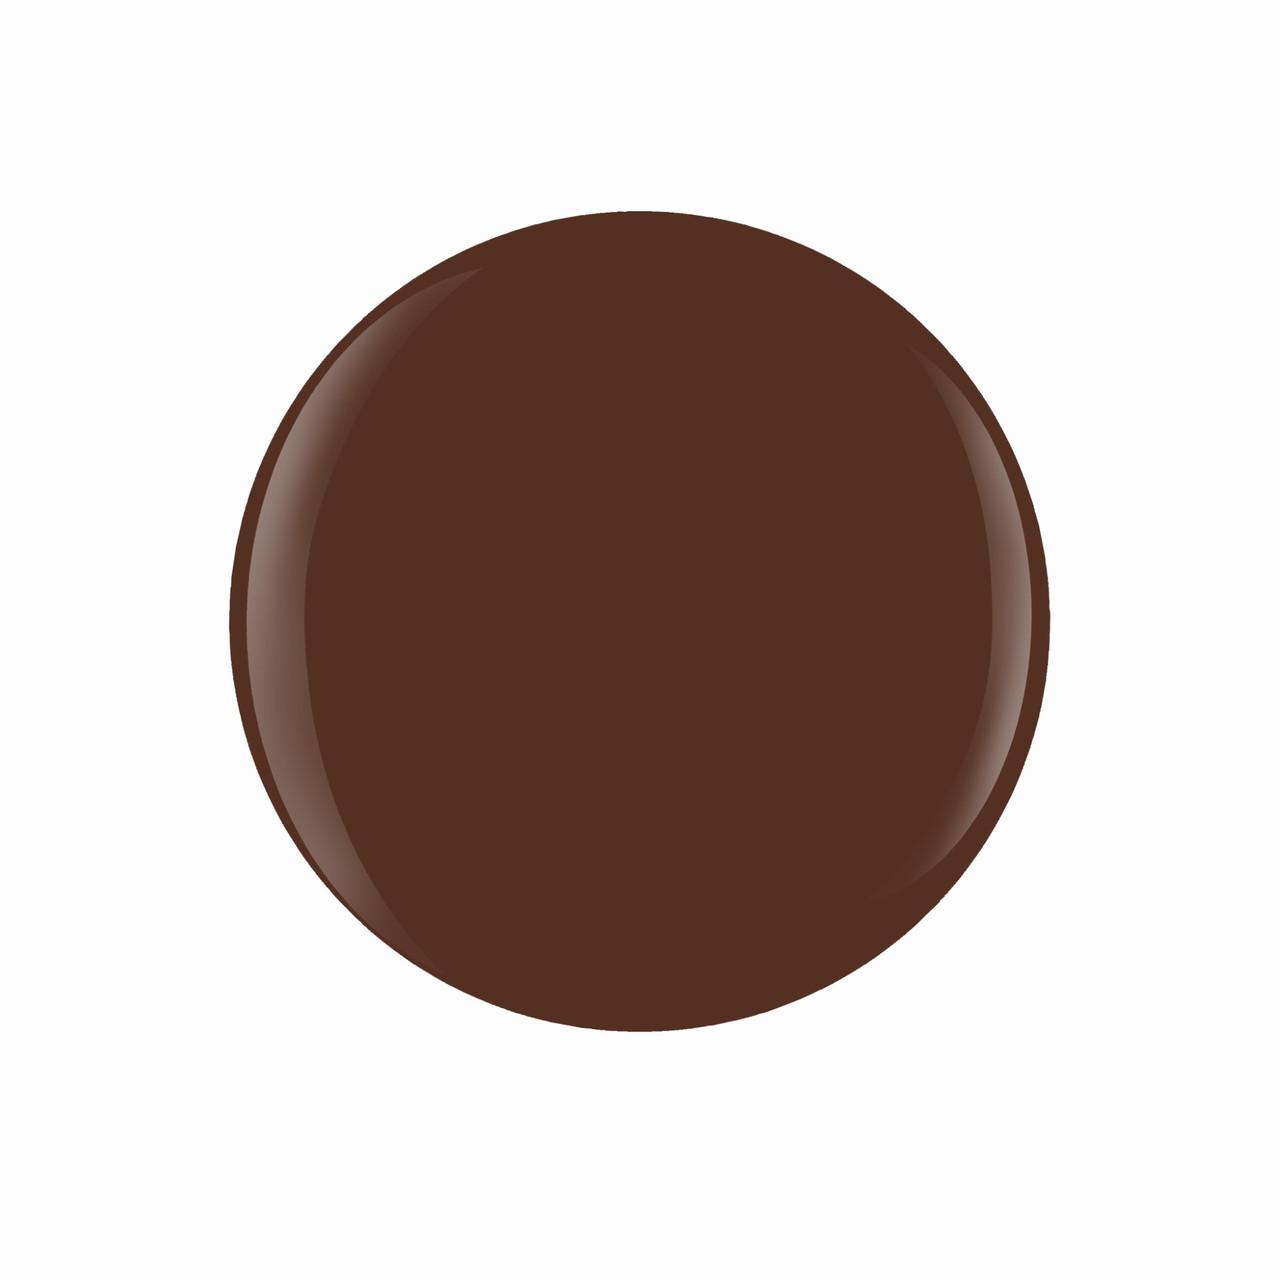 "Morgan Taylor Nail Lacquer ""Totally Trailblazing"" - Hot Chocolate Crème - 15 mL   .5 fl. Oz."